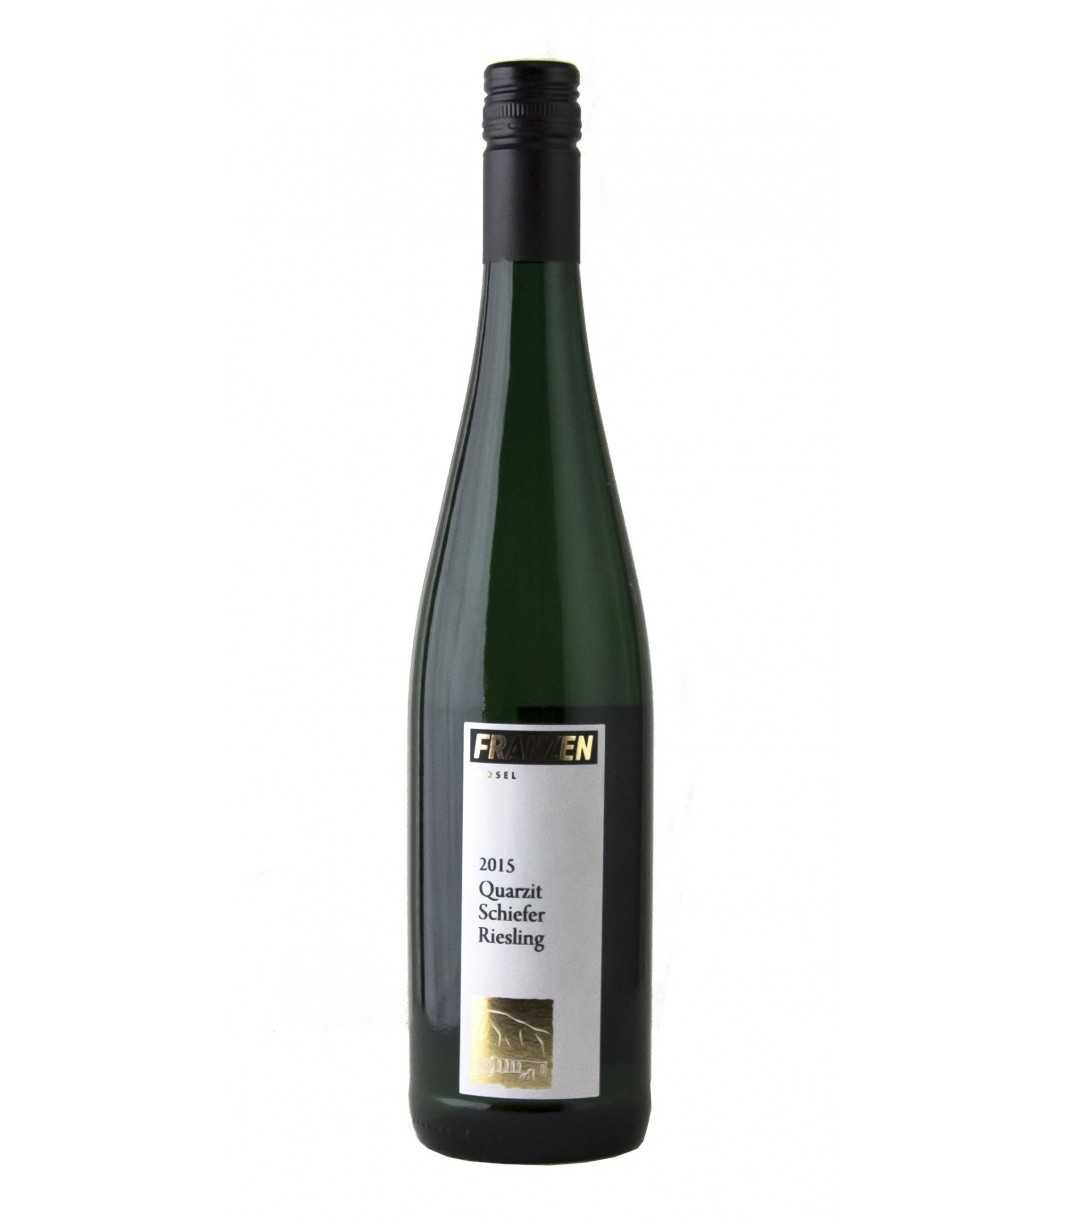 2017 Quarzit-Schiefer Riesling, Trocken, Weingut Franzen, Mosel